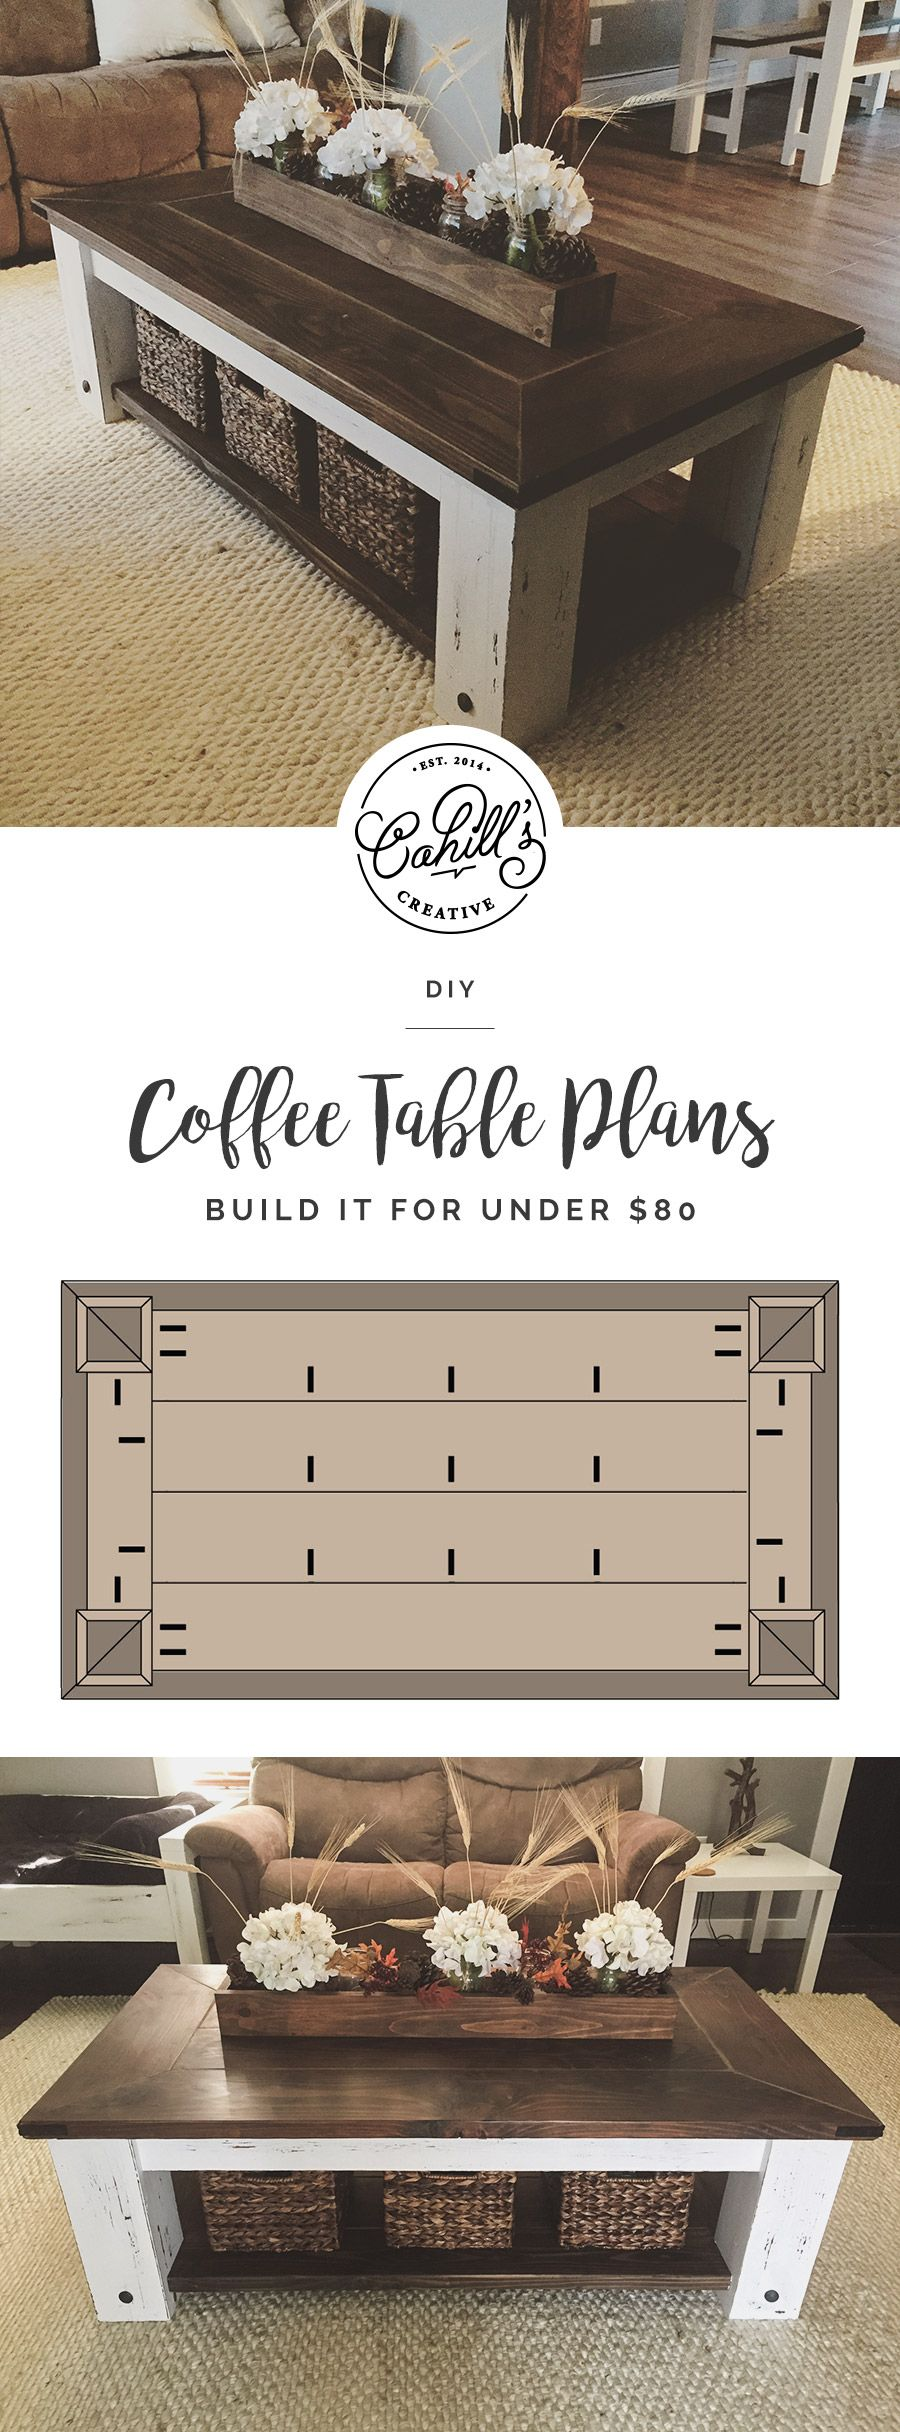 DIY Farmhouse Coffee Table Plans Woodworking Plans, DIY